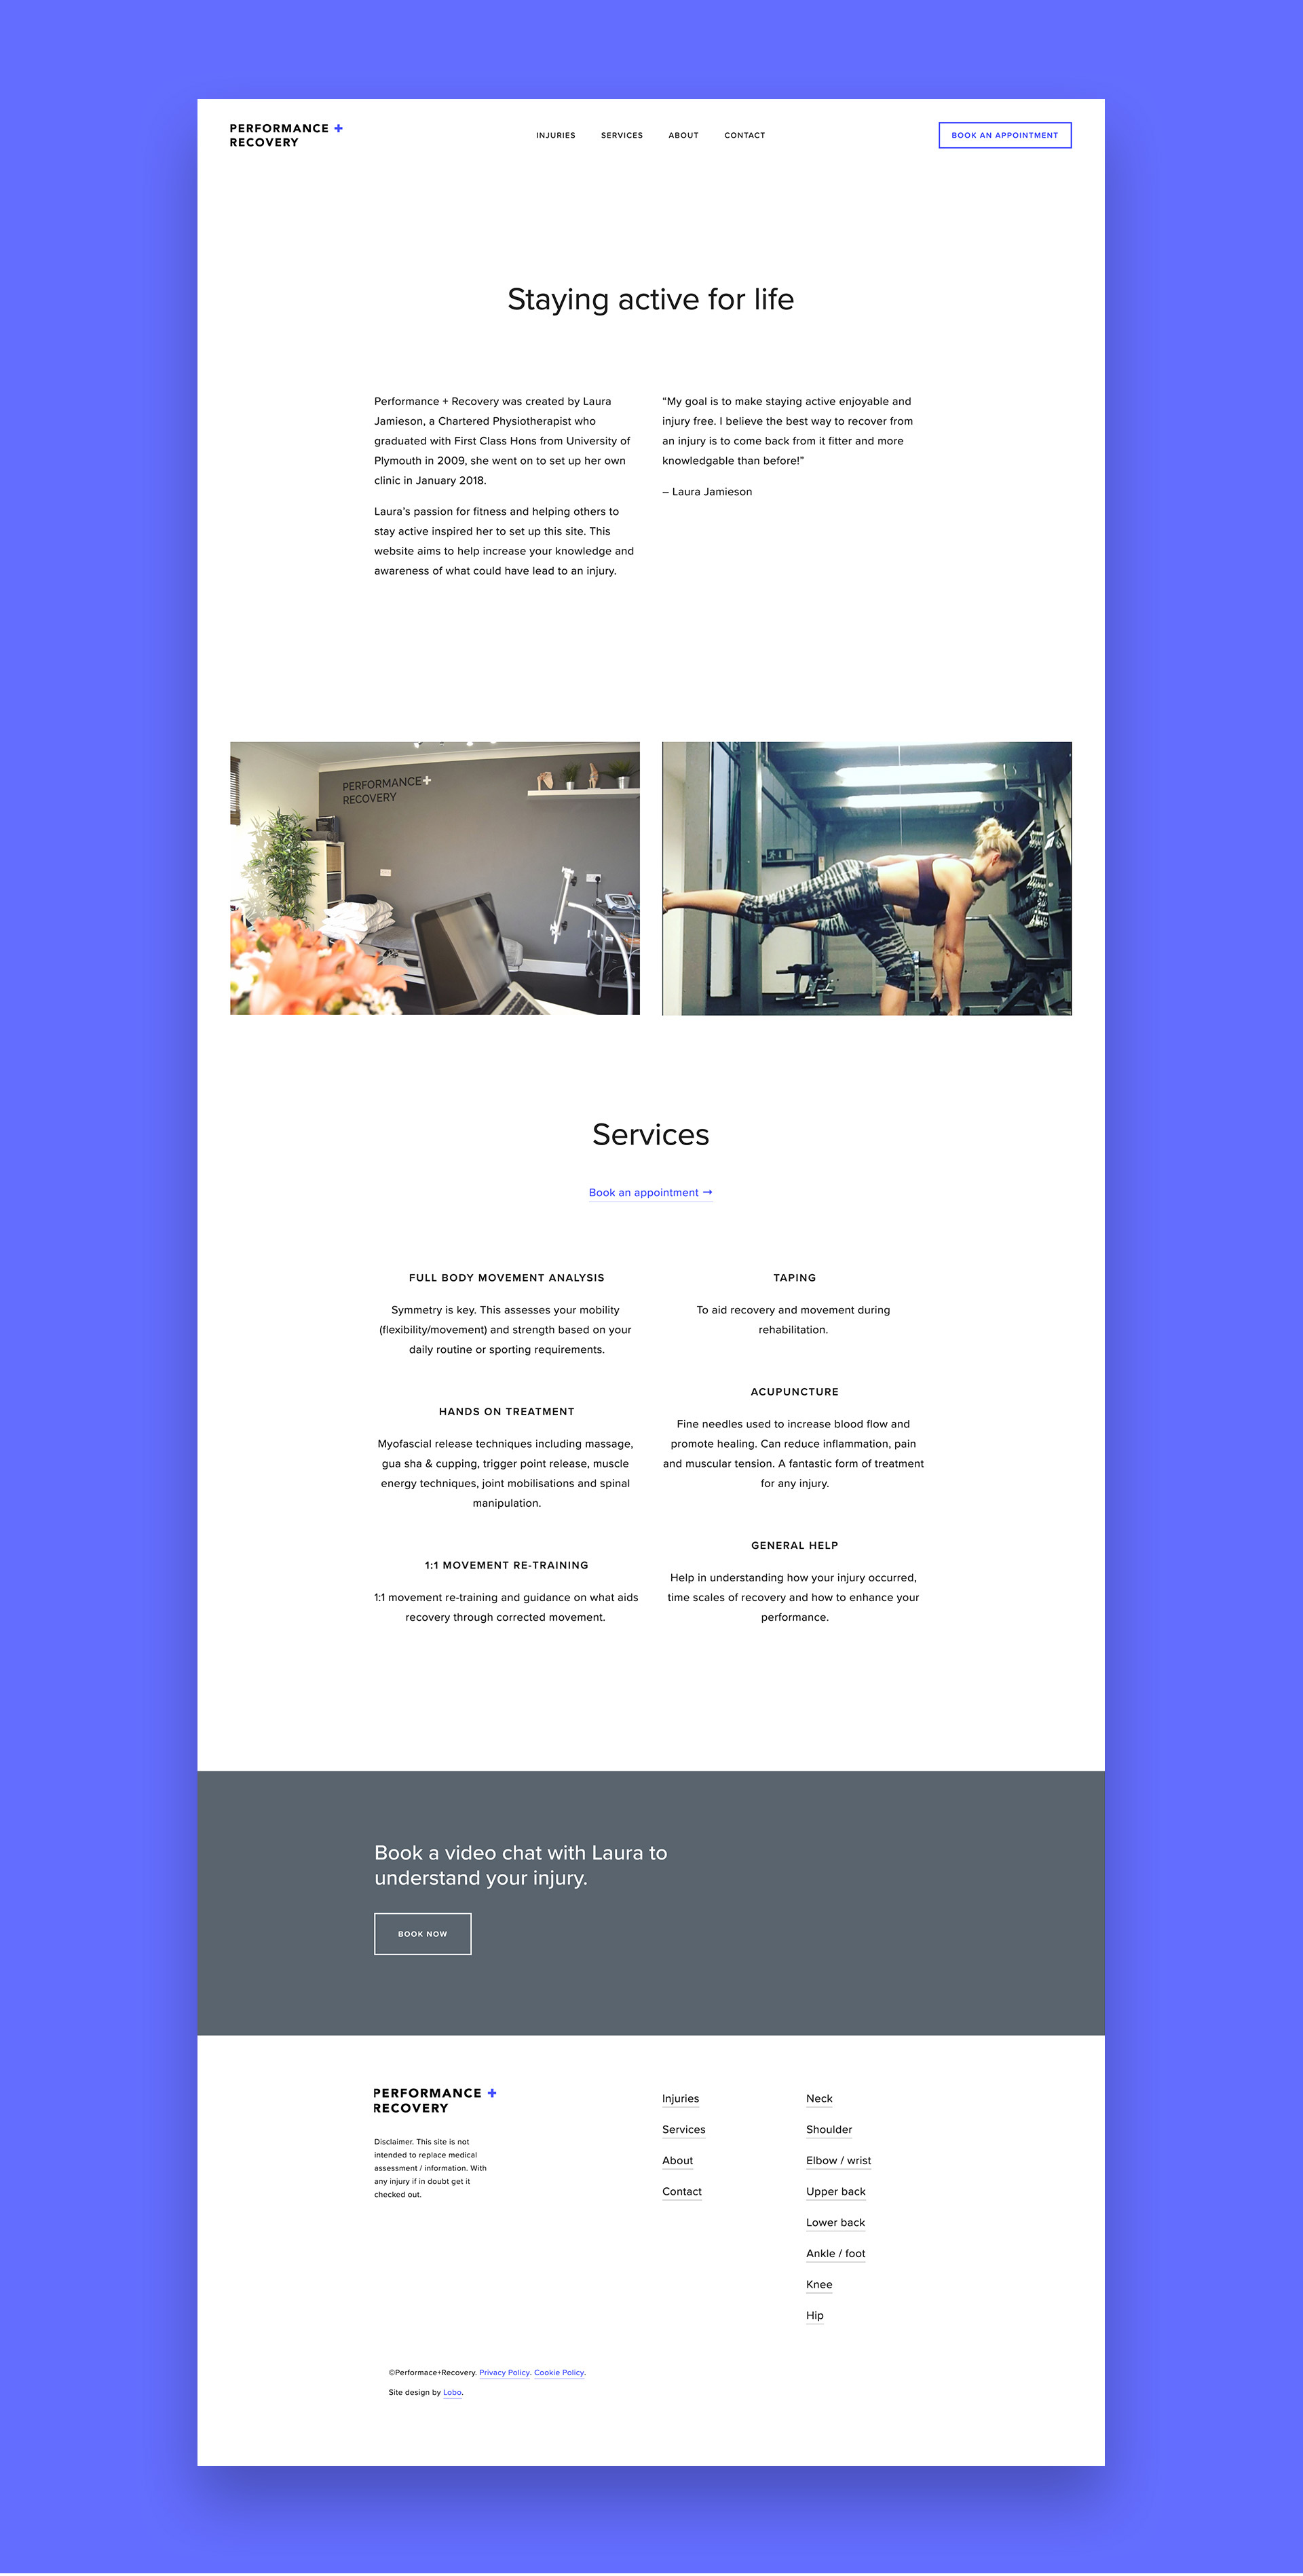 04-Lobo-Creative Performance+Recovery Bournemouth-brand-design-website-design-case-study.jpg